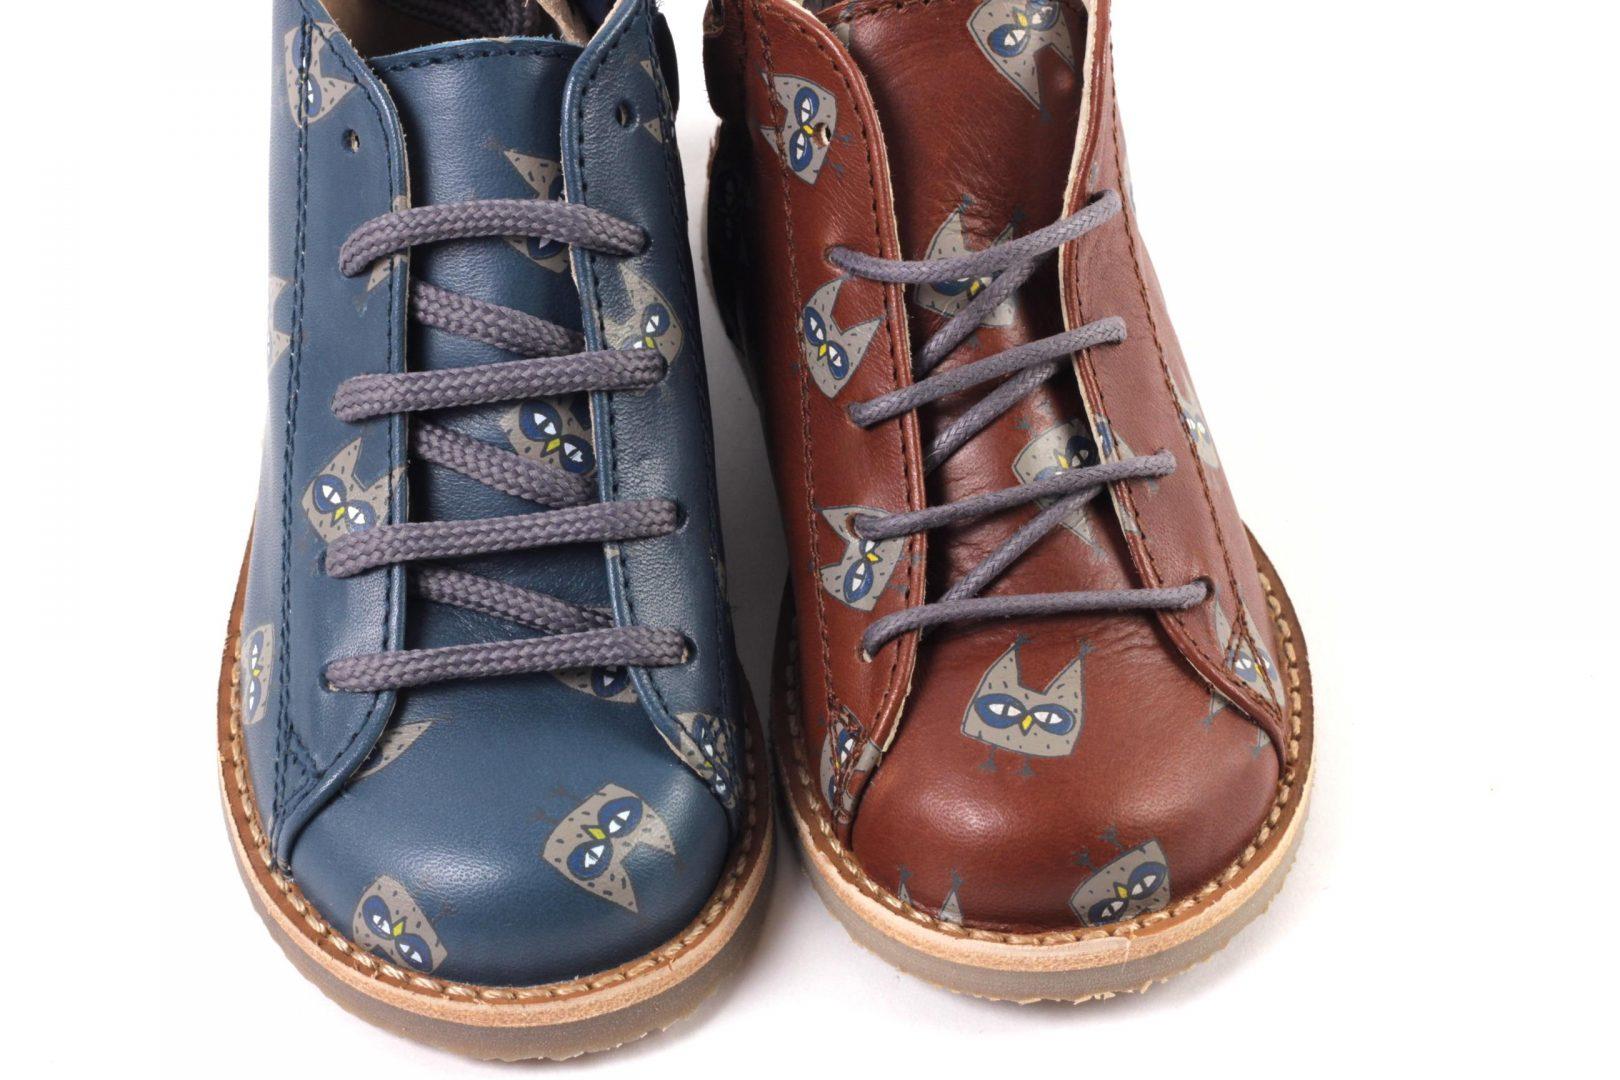 MDJ uiltje 2 - Schoenen online kopen